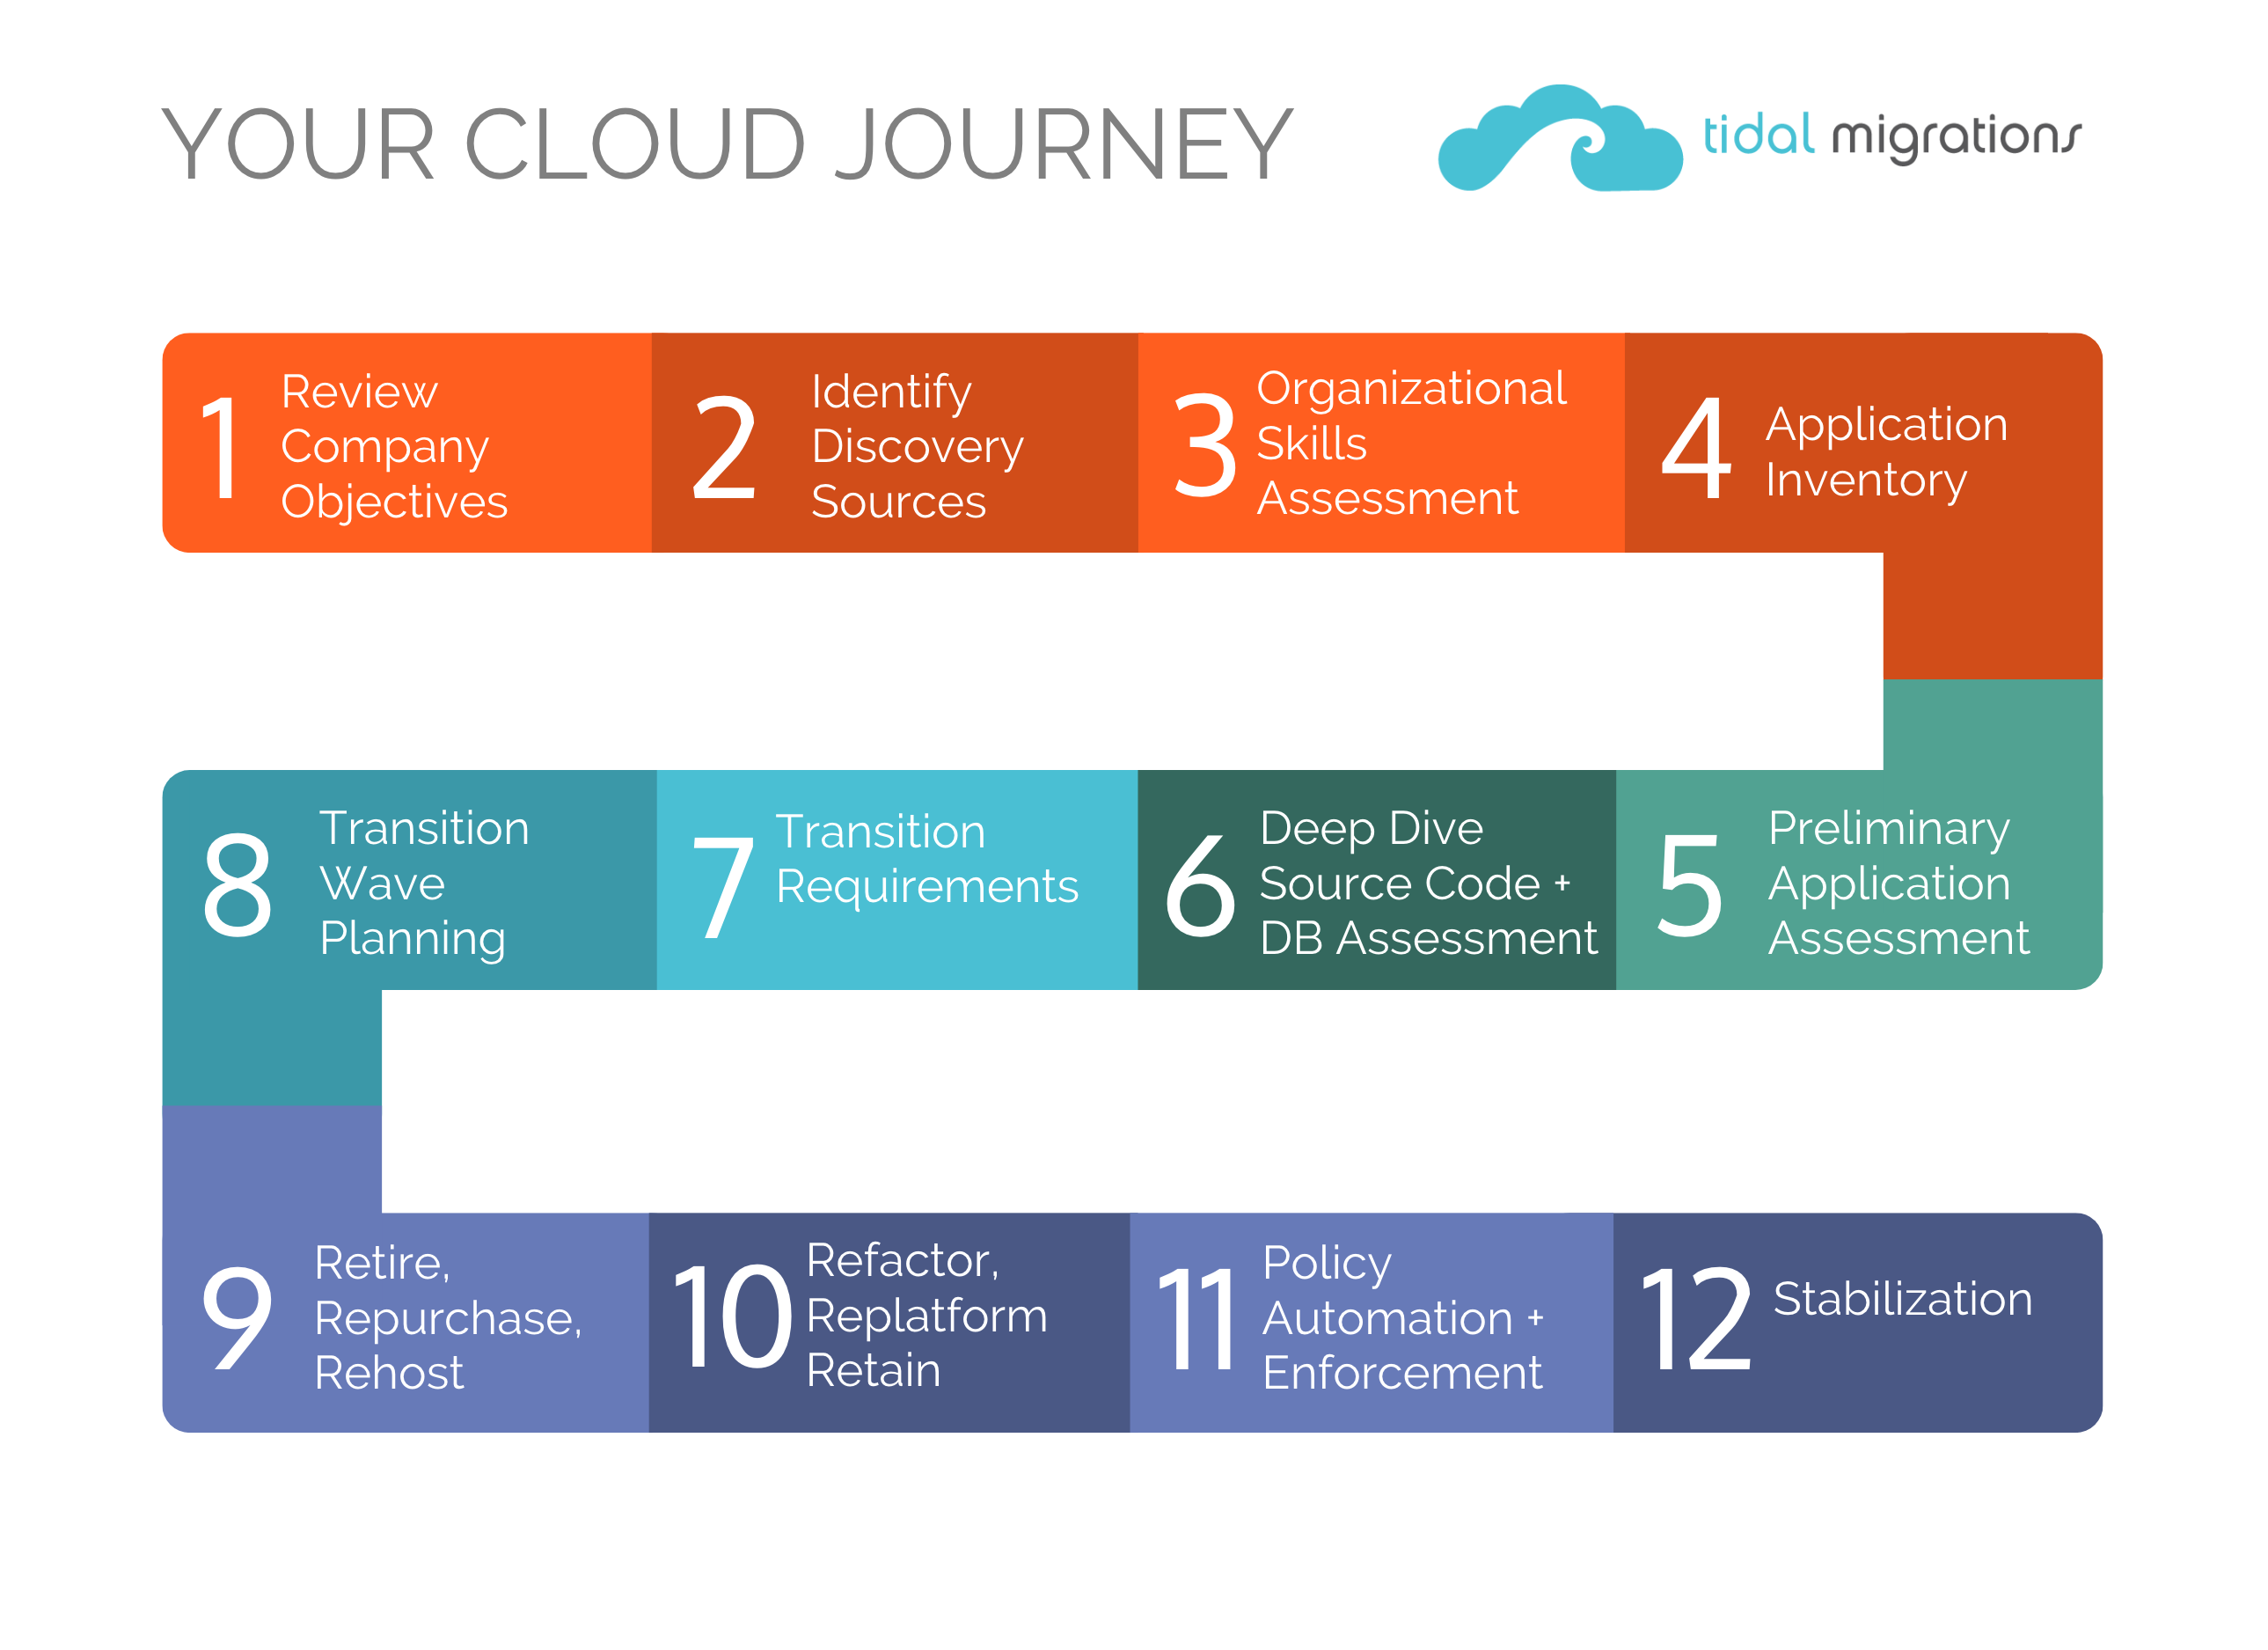 application assessment for cloud migration